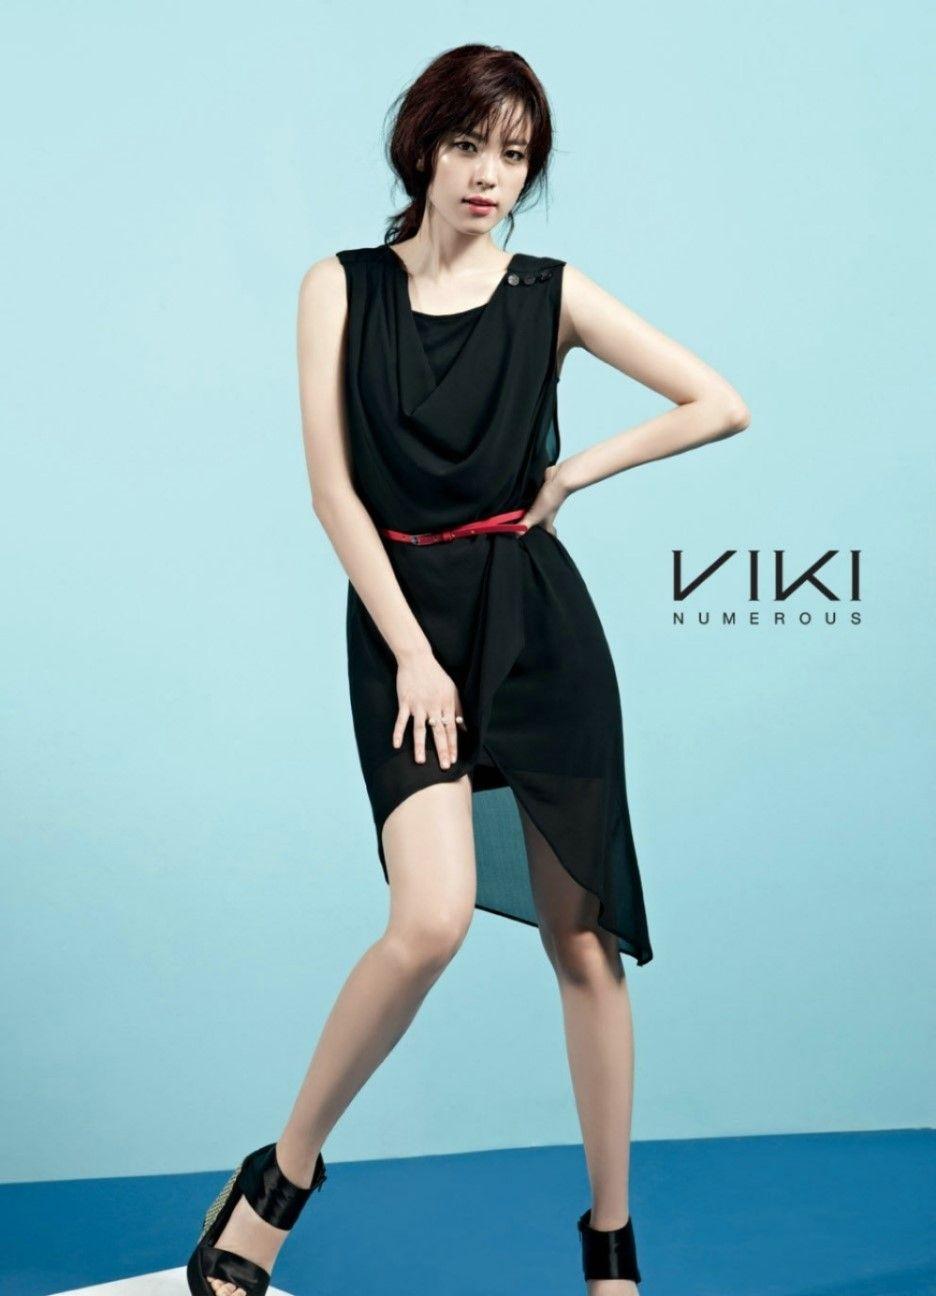 Han Hyo Ju 한효주 Viki 2013 화보 Actress Han Hyo Ju